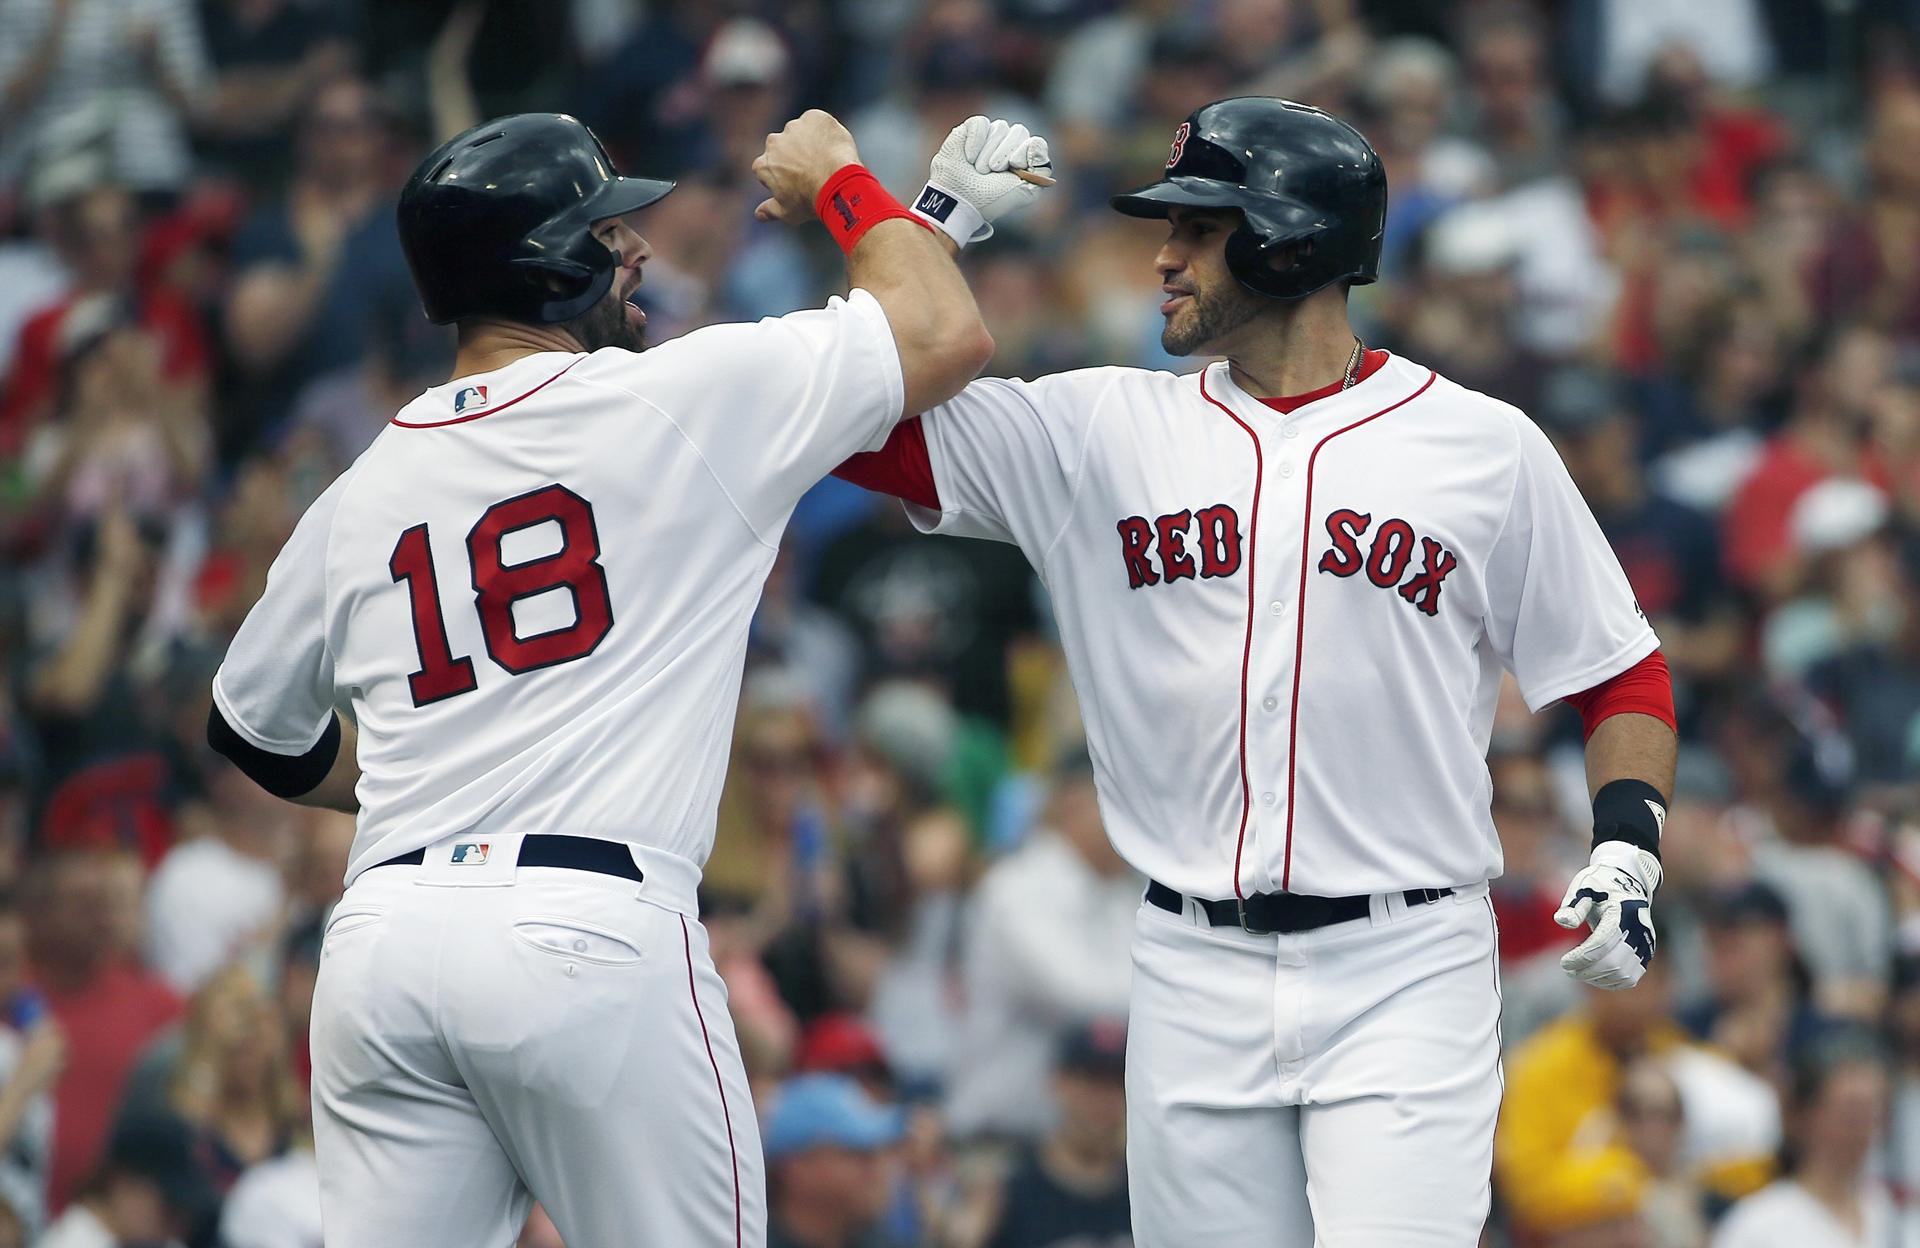 Orioles Red Sox Baseball_1526851098789